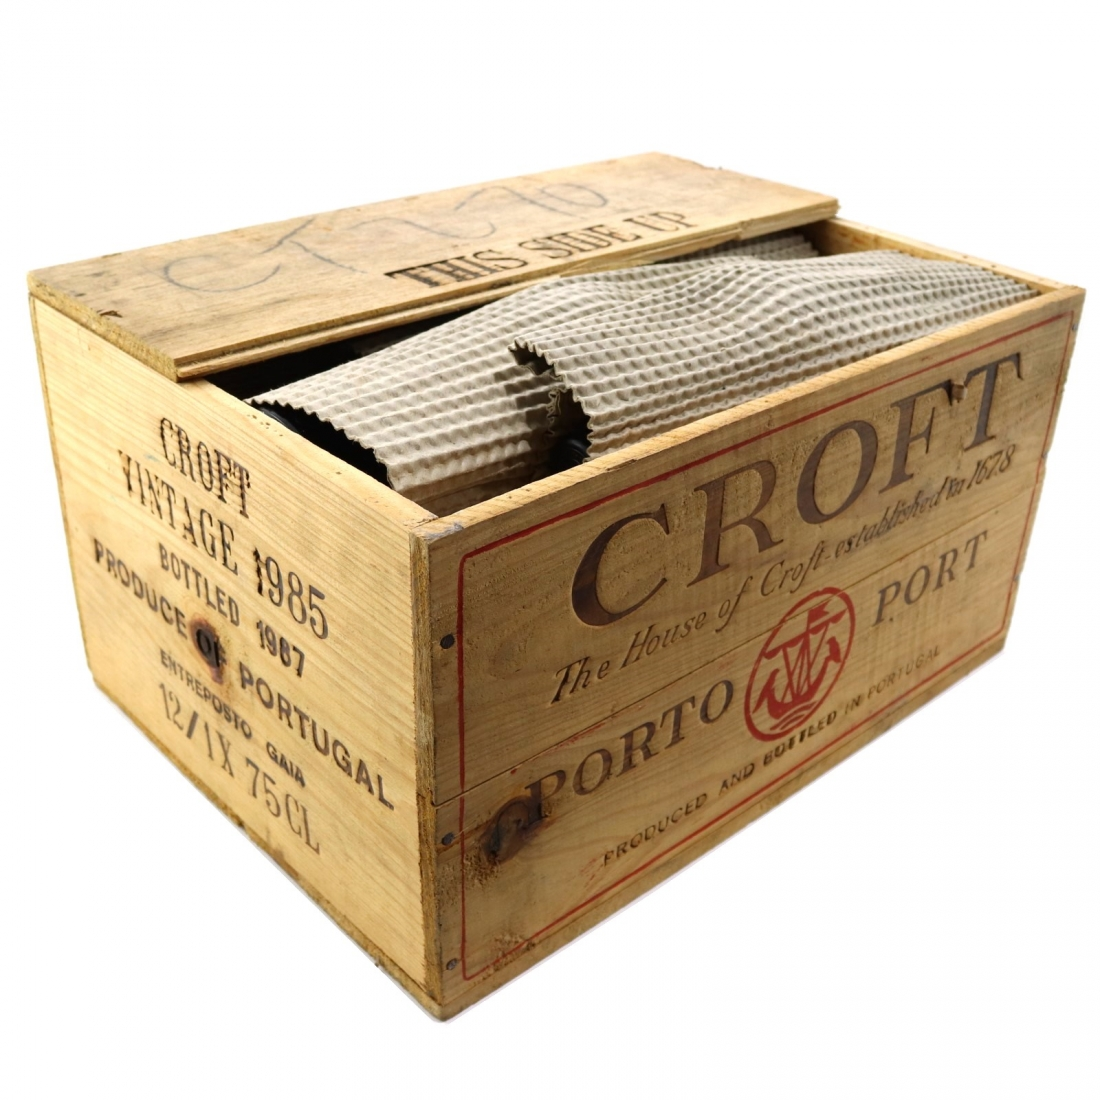 Croft 1985 Vintage Port 12x75cl / Original Wooden Case